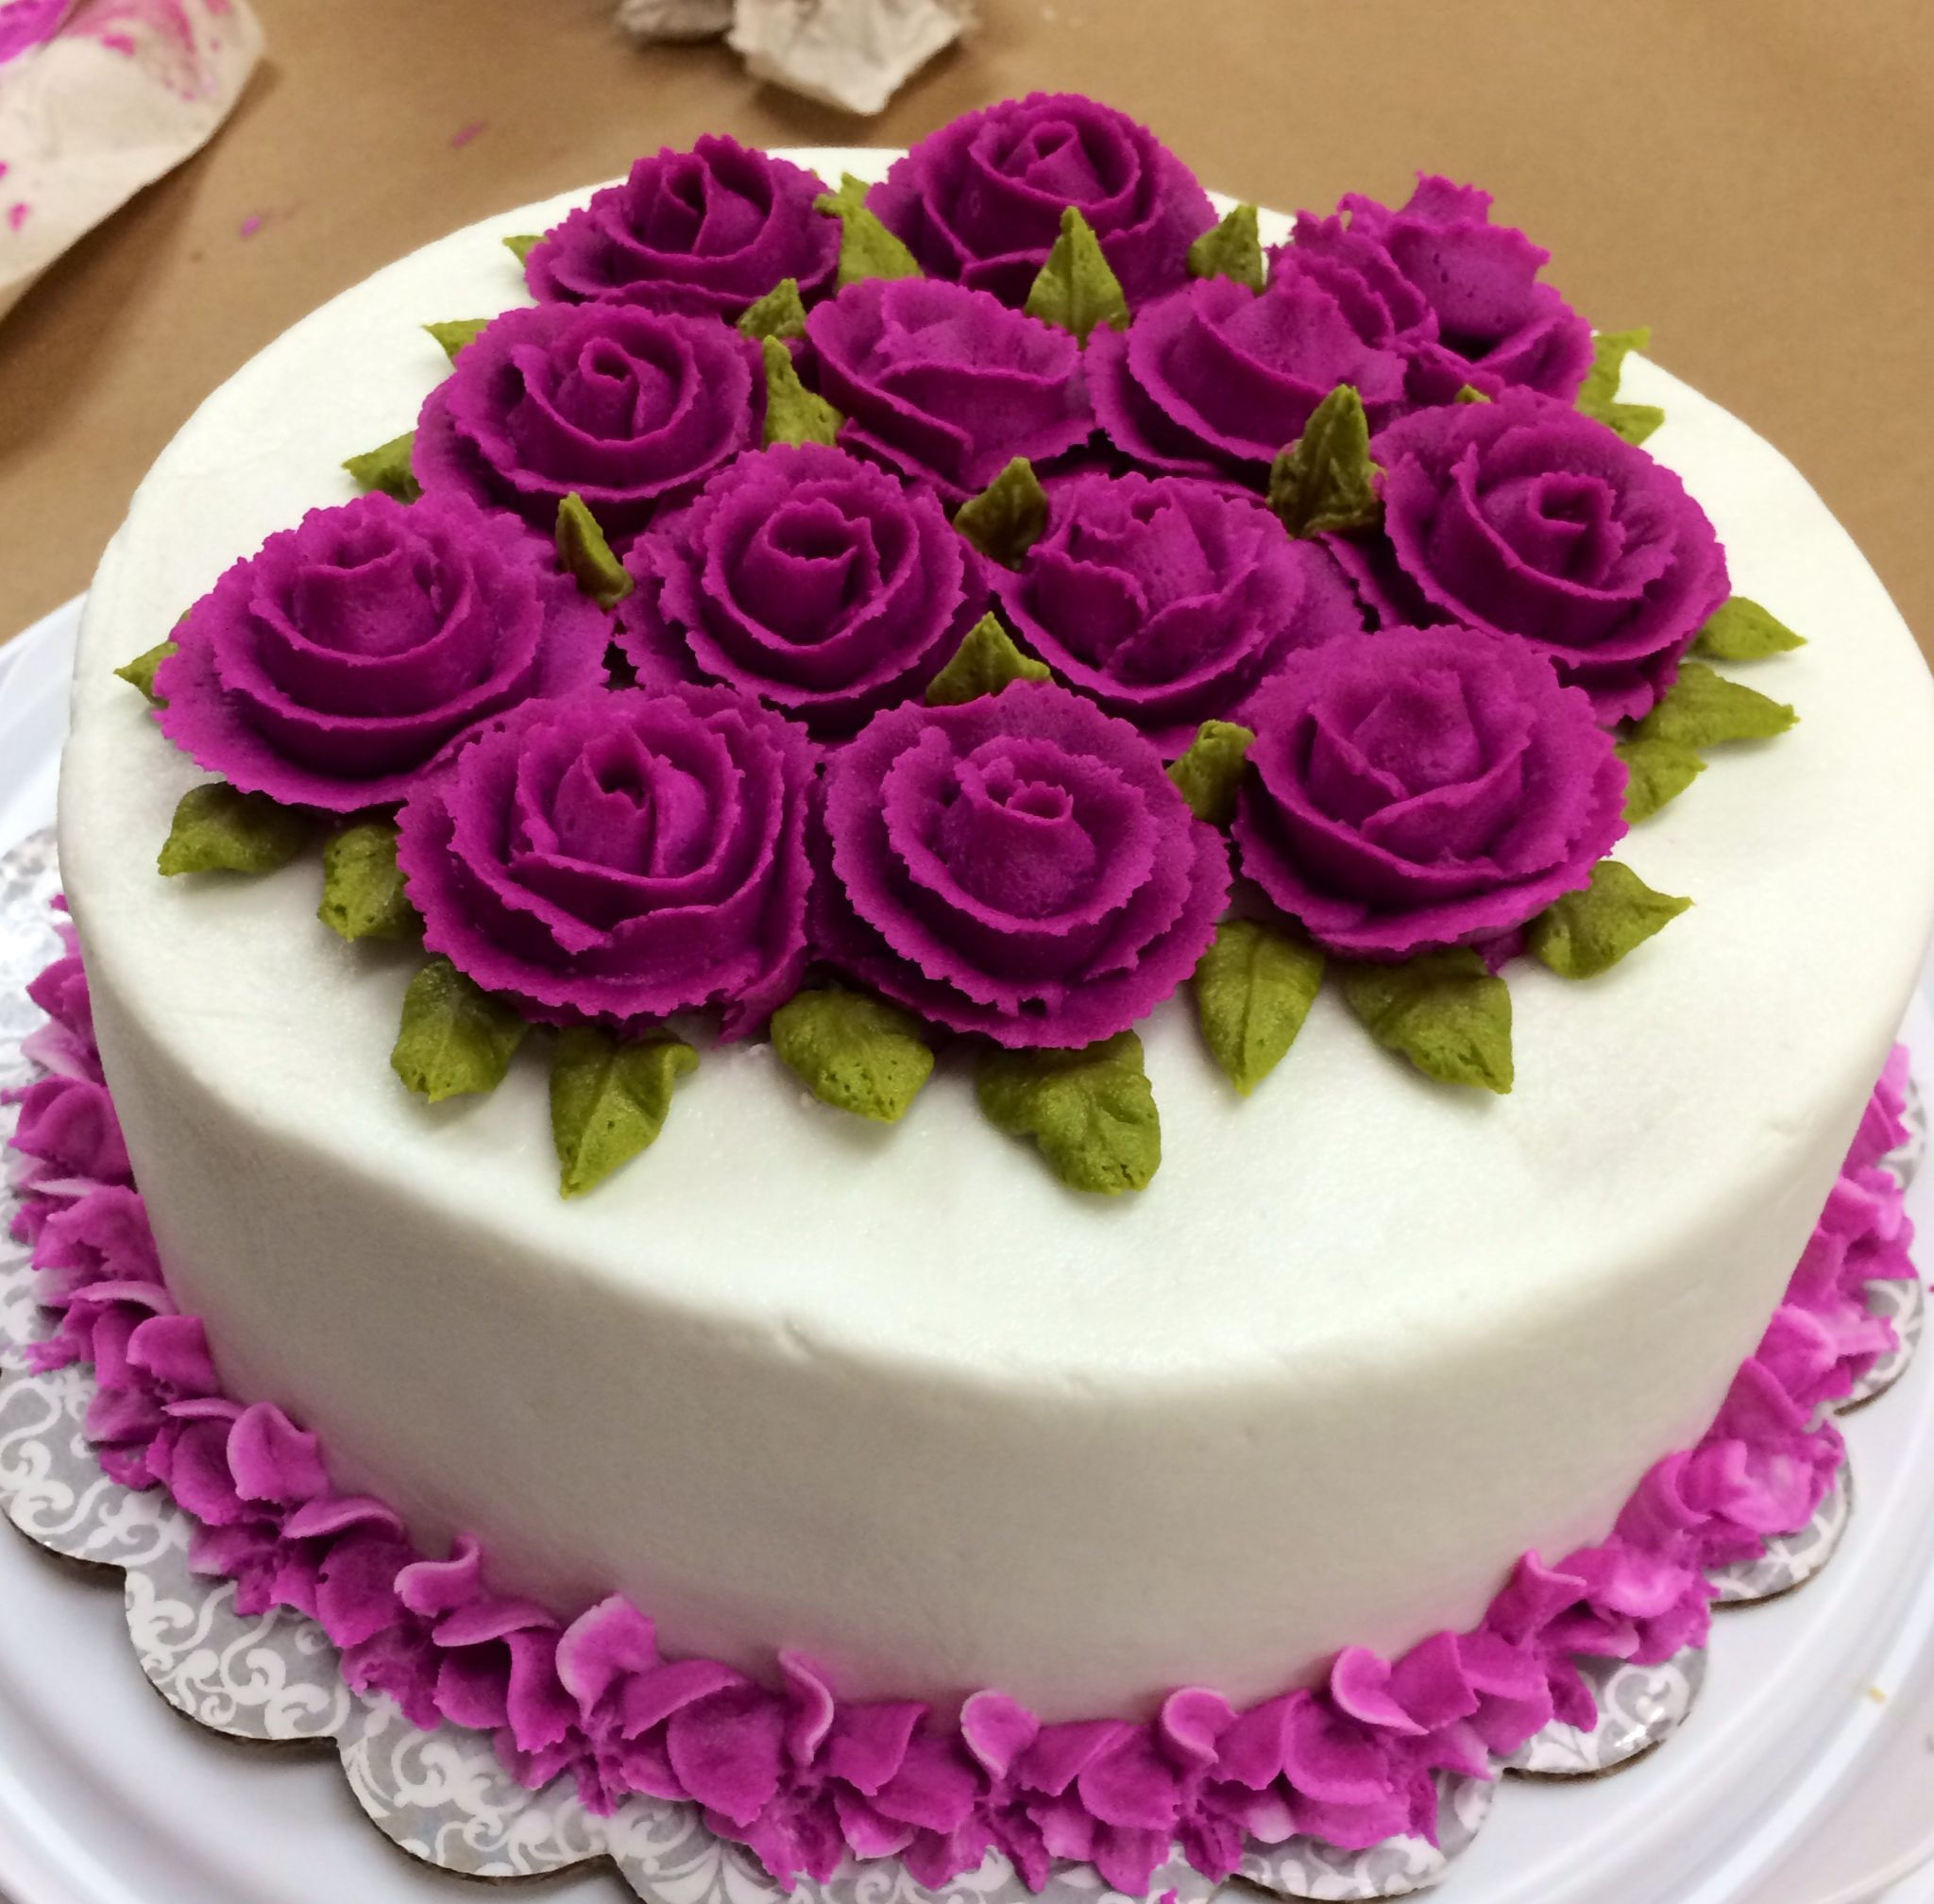 Image Result For Decorating Cake Buttercream